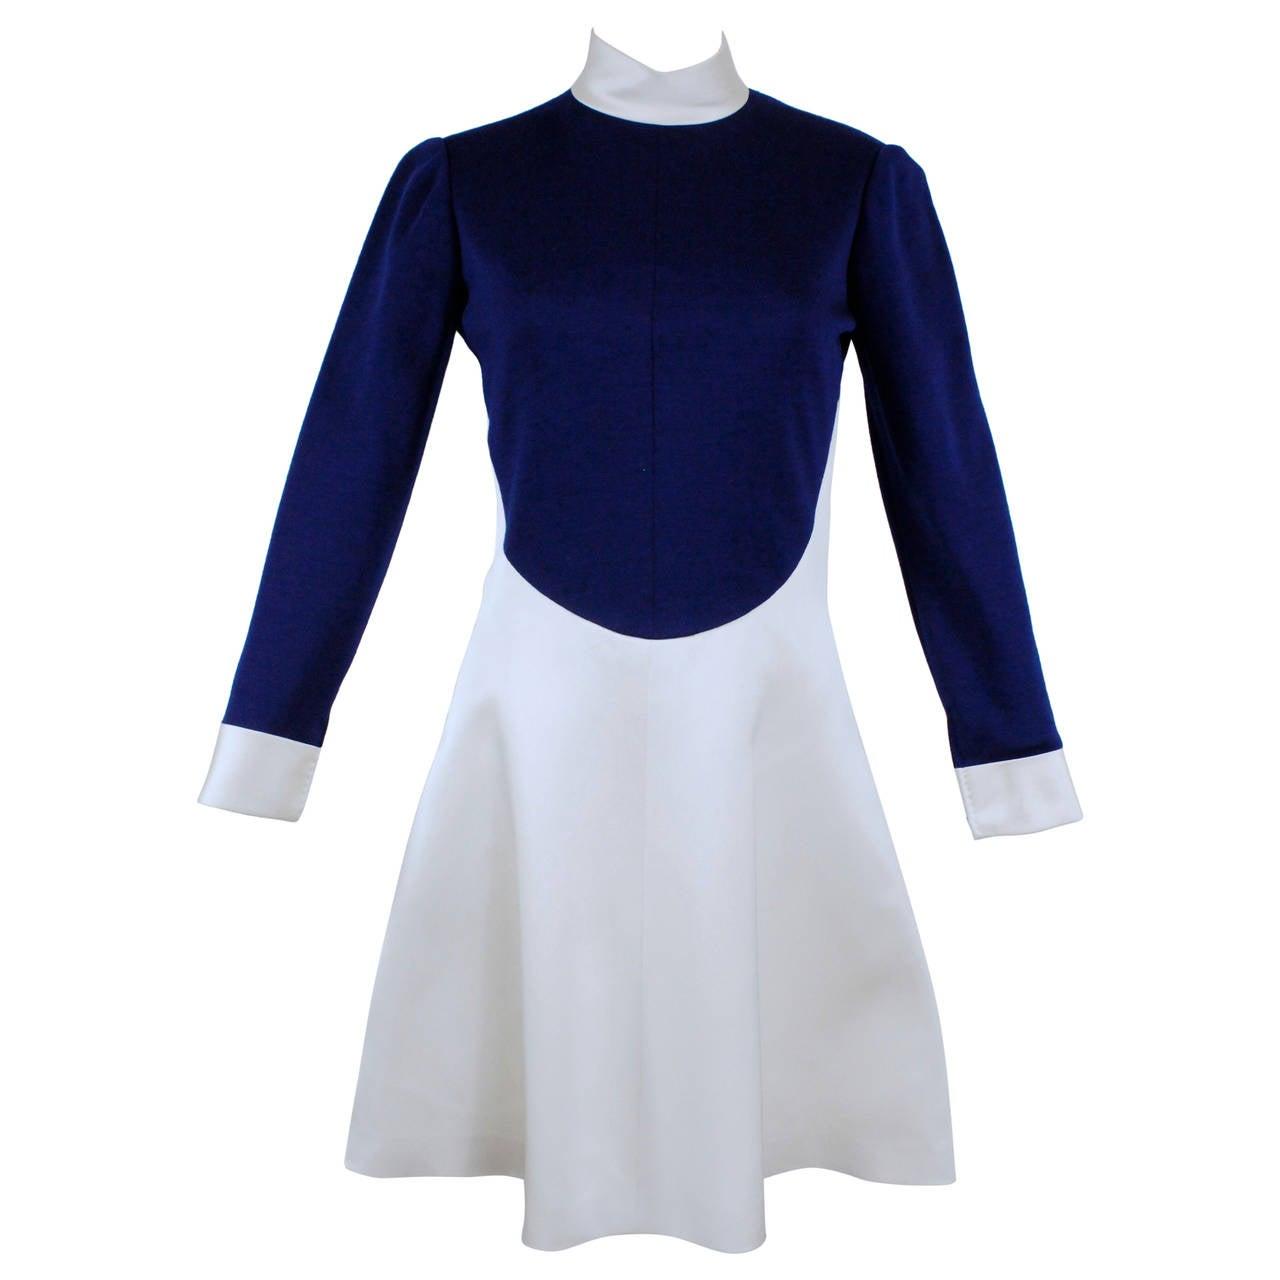 1960s Geoffrey Beene Navy Wool and Eggshell Mod Dress 1